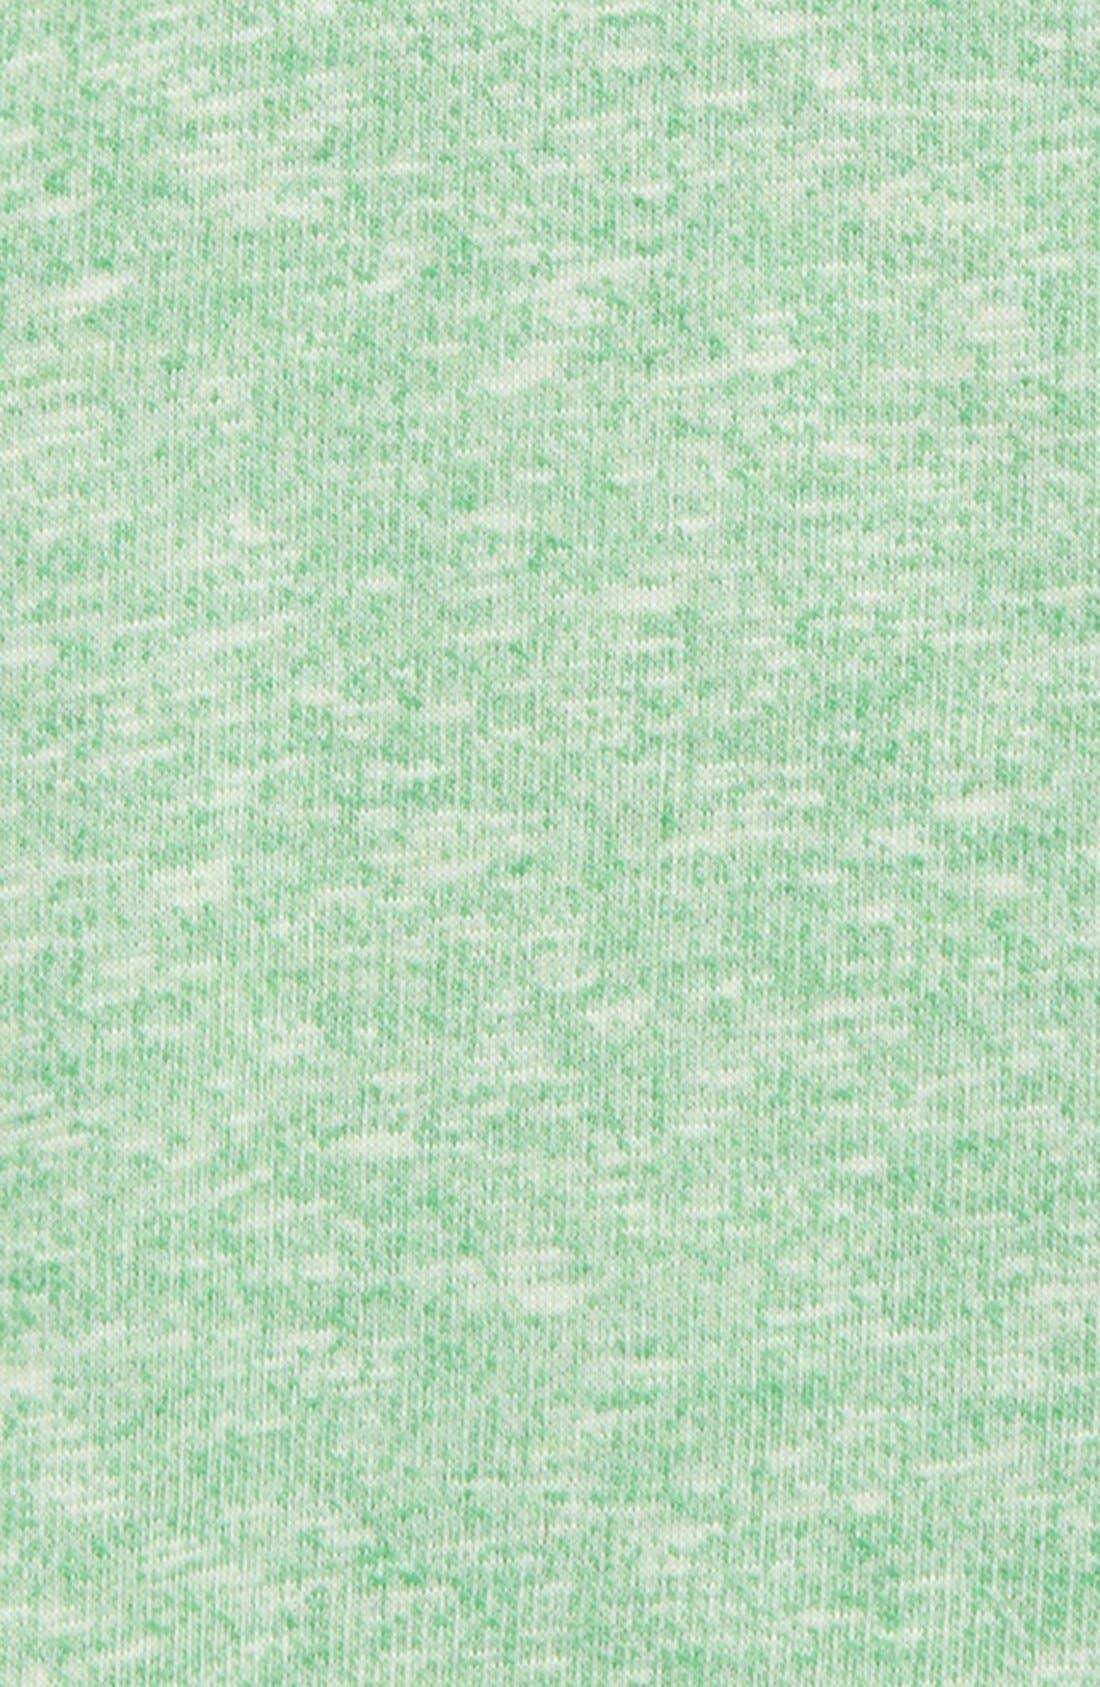 Space Dye Fleece Sweatshirt,                             Alternate thumbnail 2, color,                             330